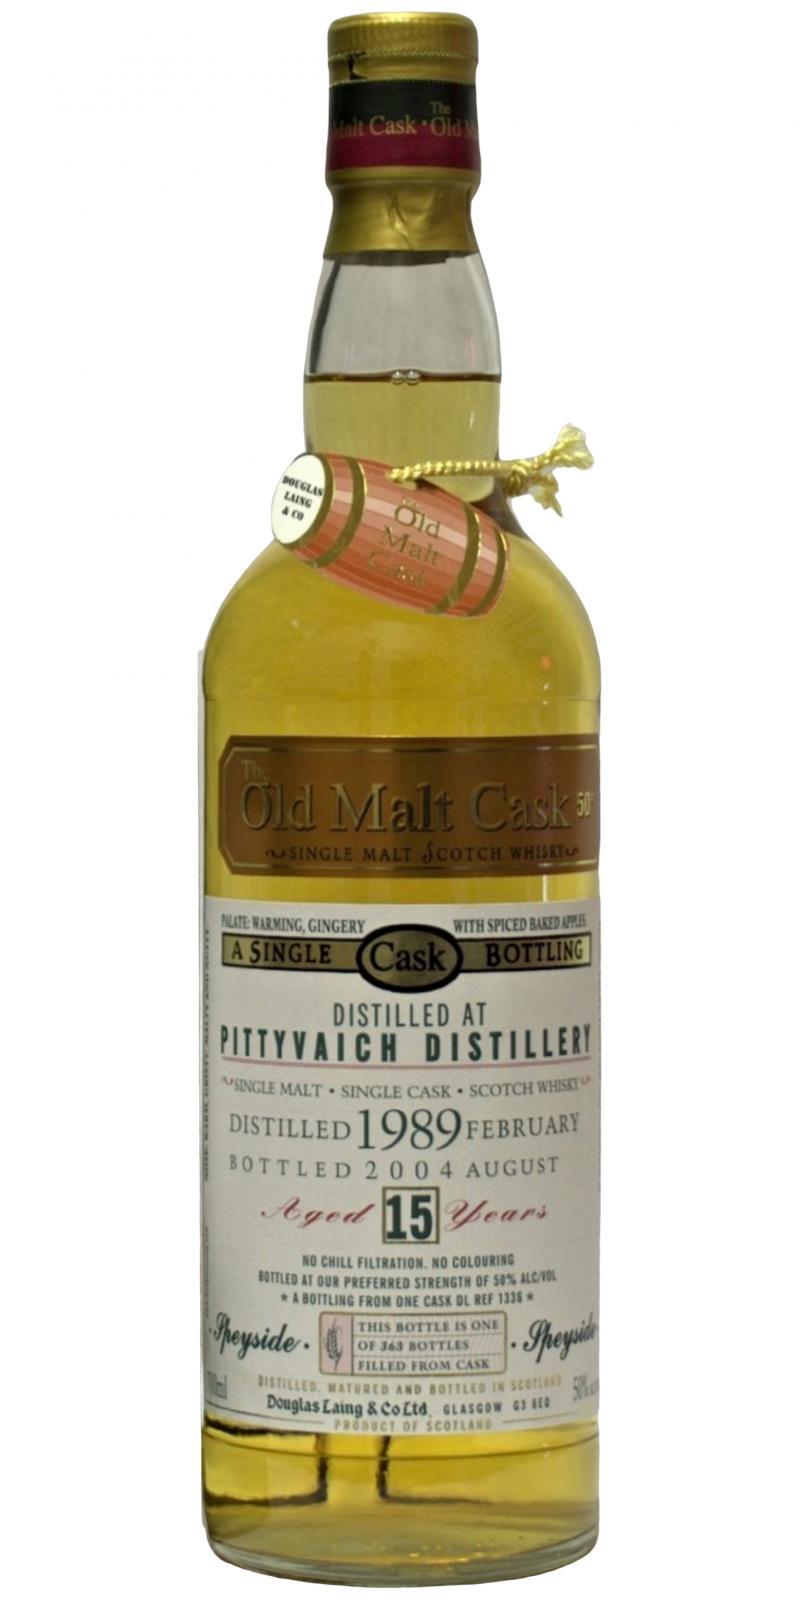 Pittyvaich 1989 DL